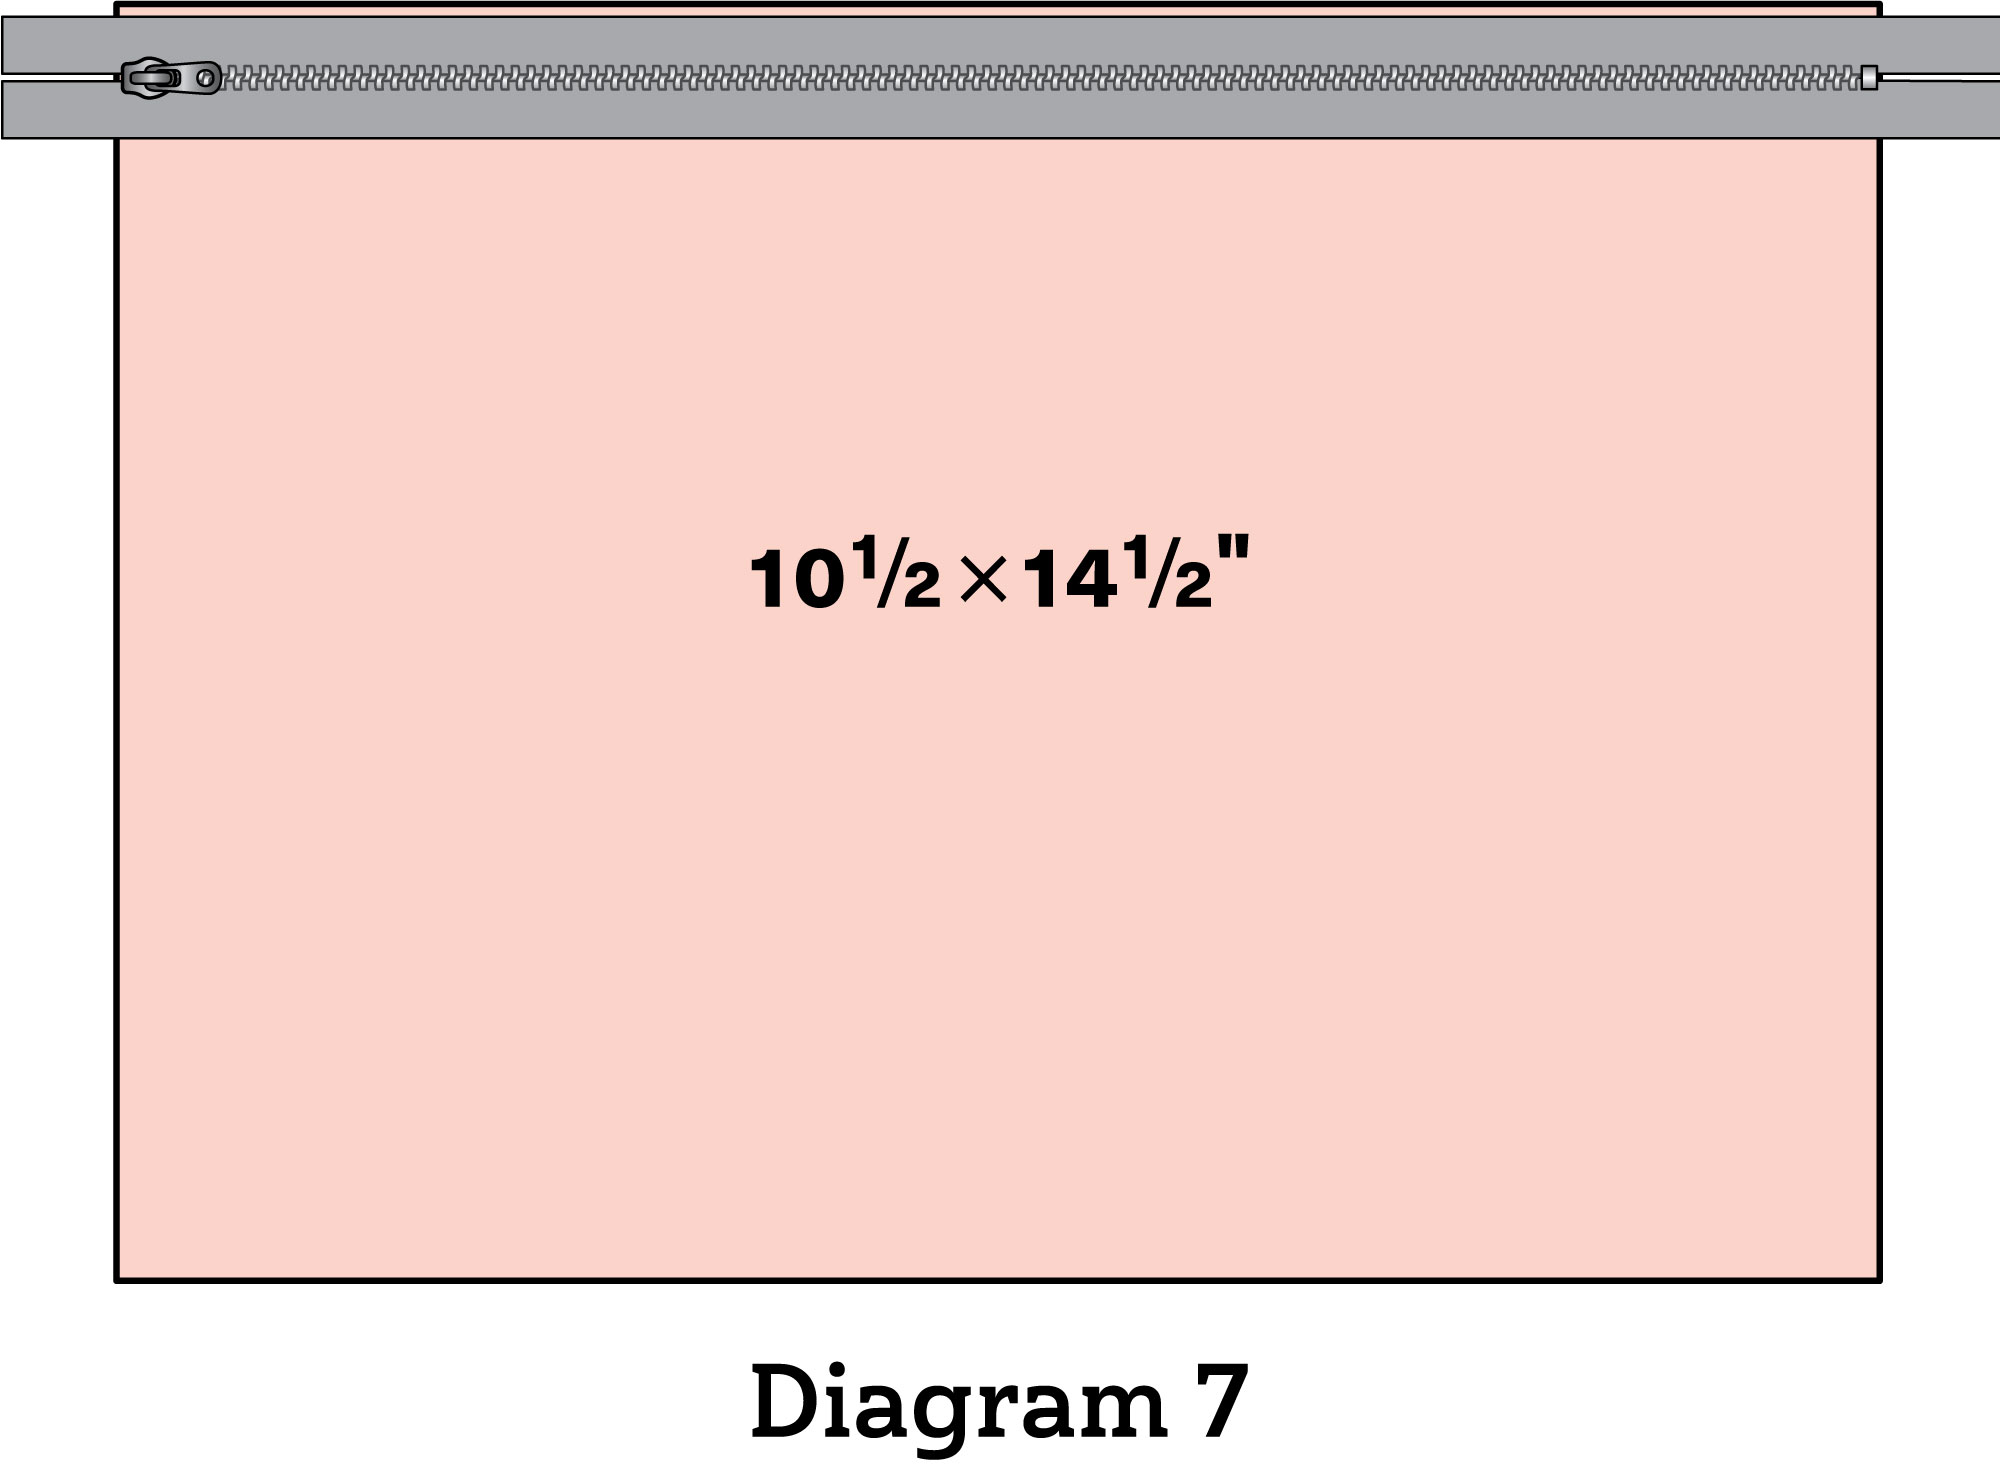 Pinwheel Zipper Pouch diagram 7